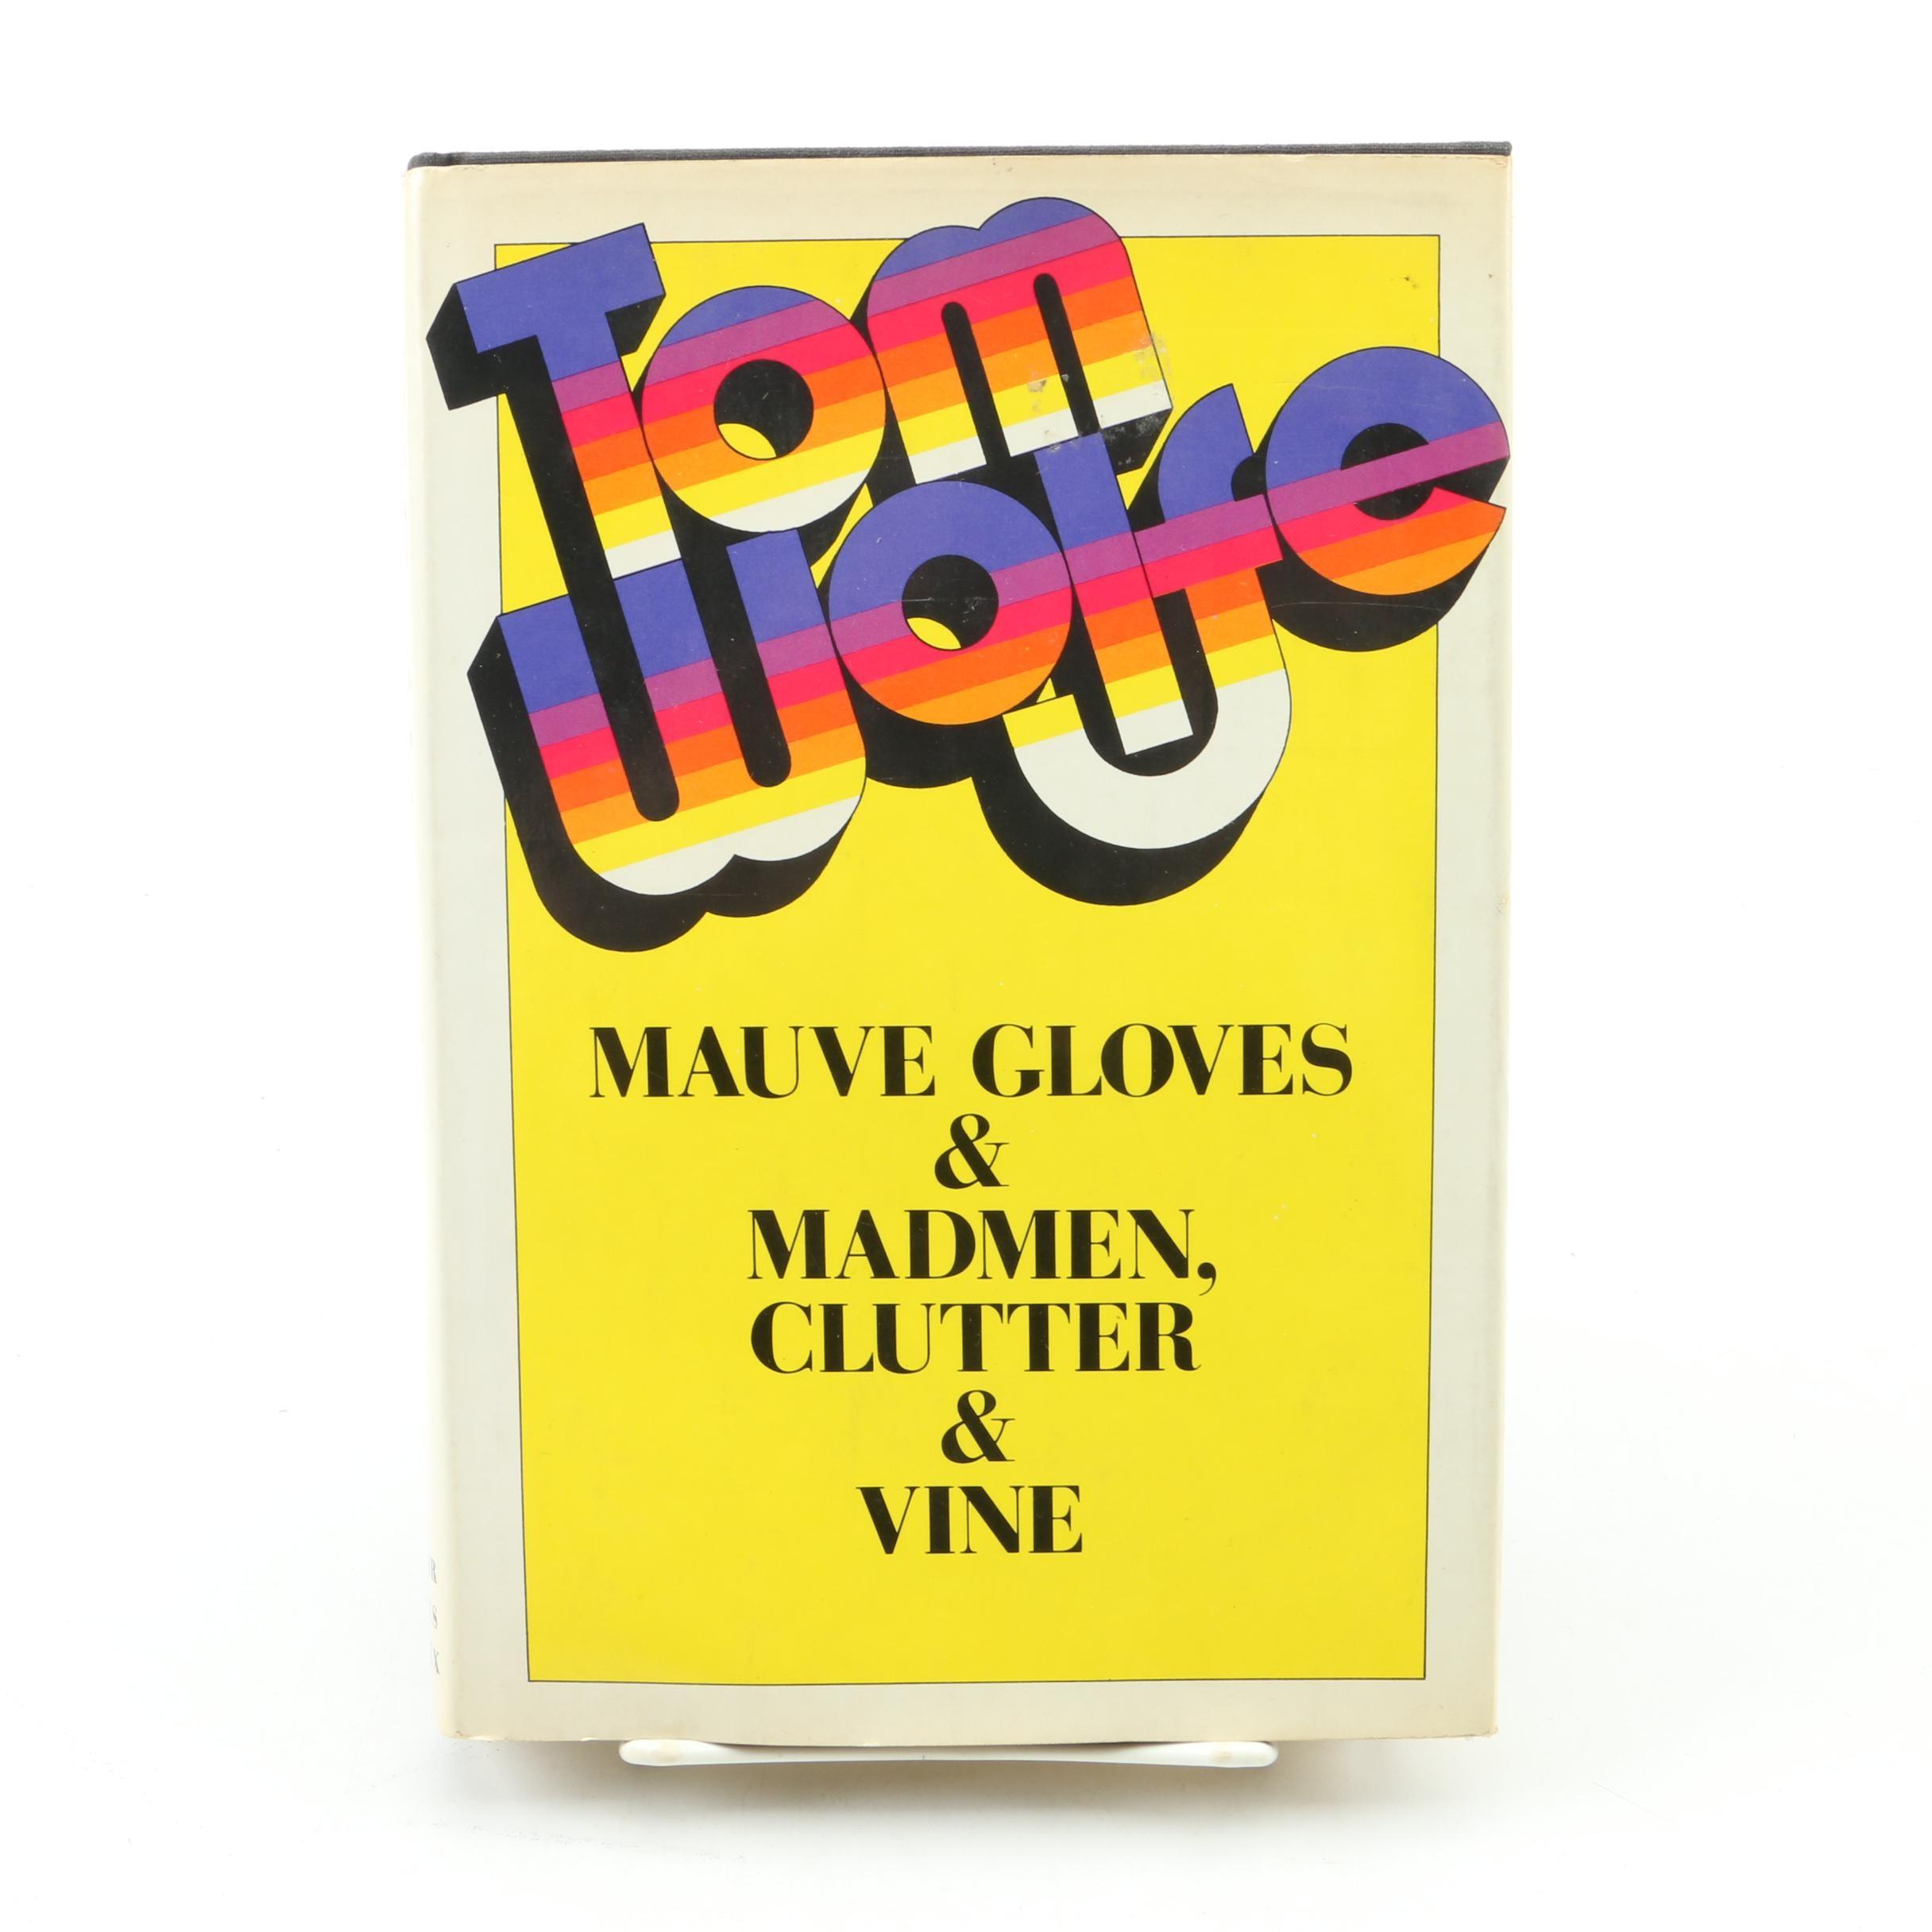 "1976 ""Mauve Gloves & Madmen, Clutter & Vine"" by Tom Wolfe"